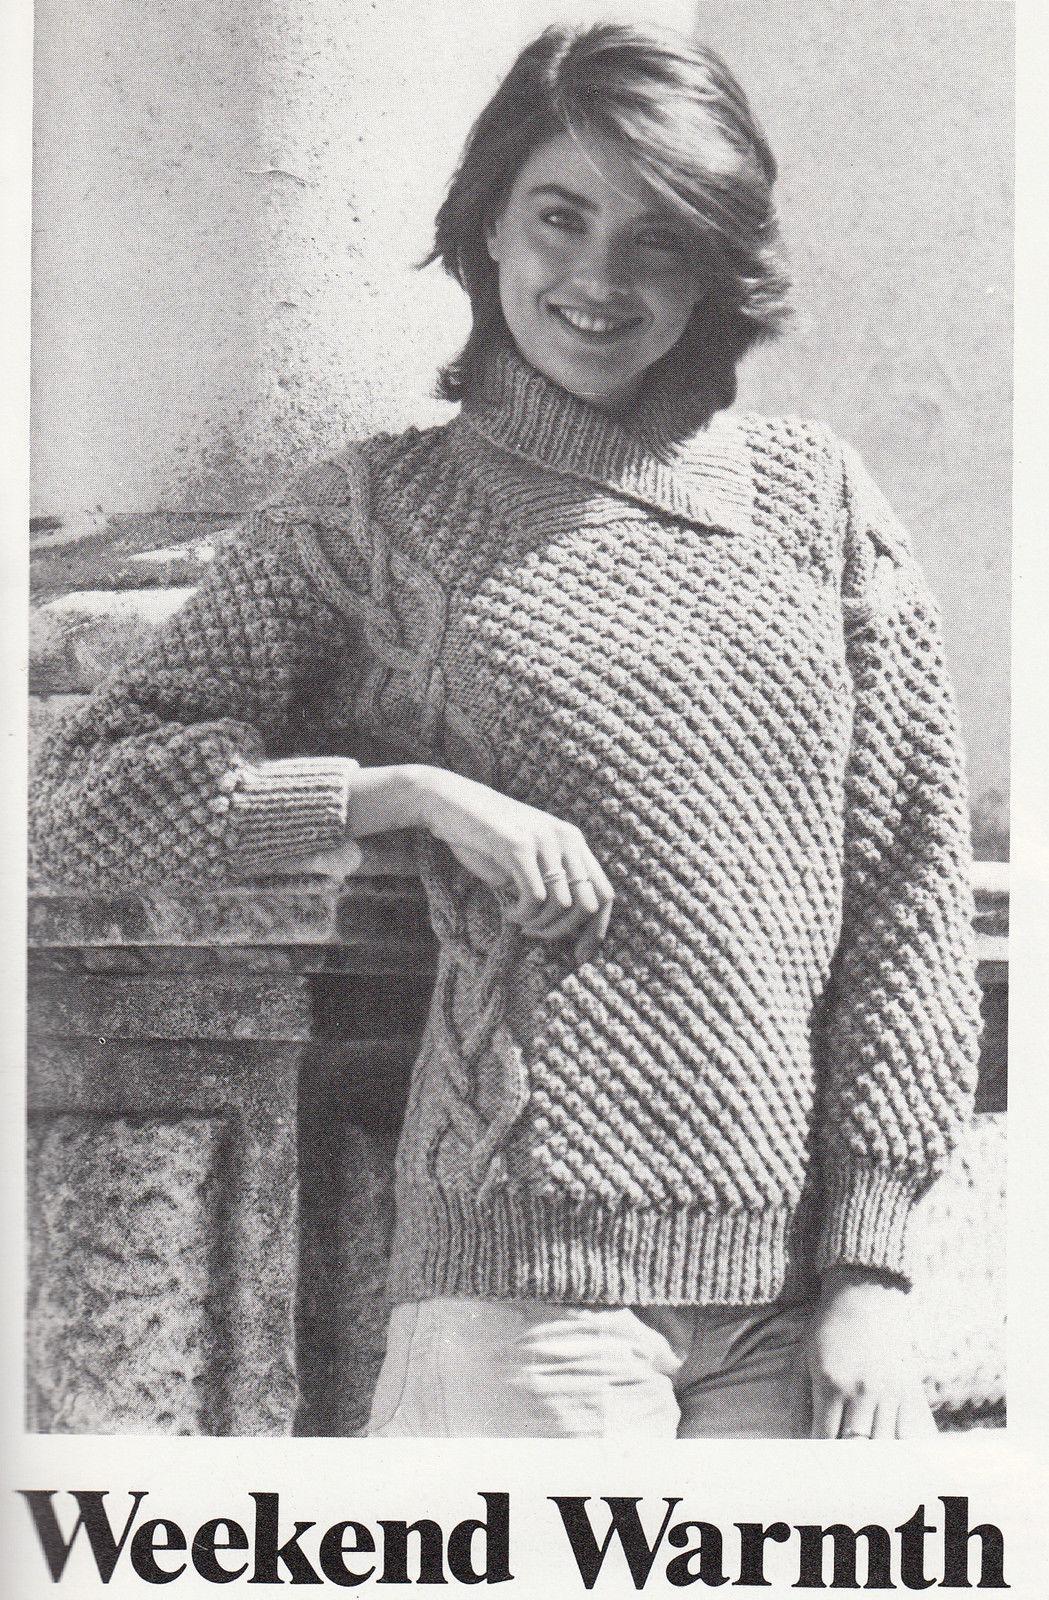 STITCHCRAFT NEEDLEWORK CROCHET KNIT EMBROIDER NOVEMBER 1981 VINTAGE MAGAZINE